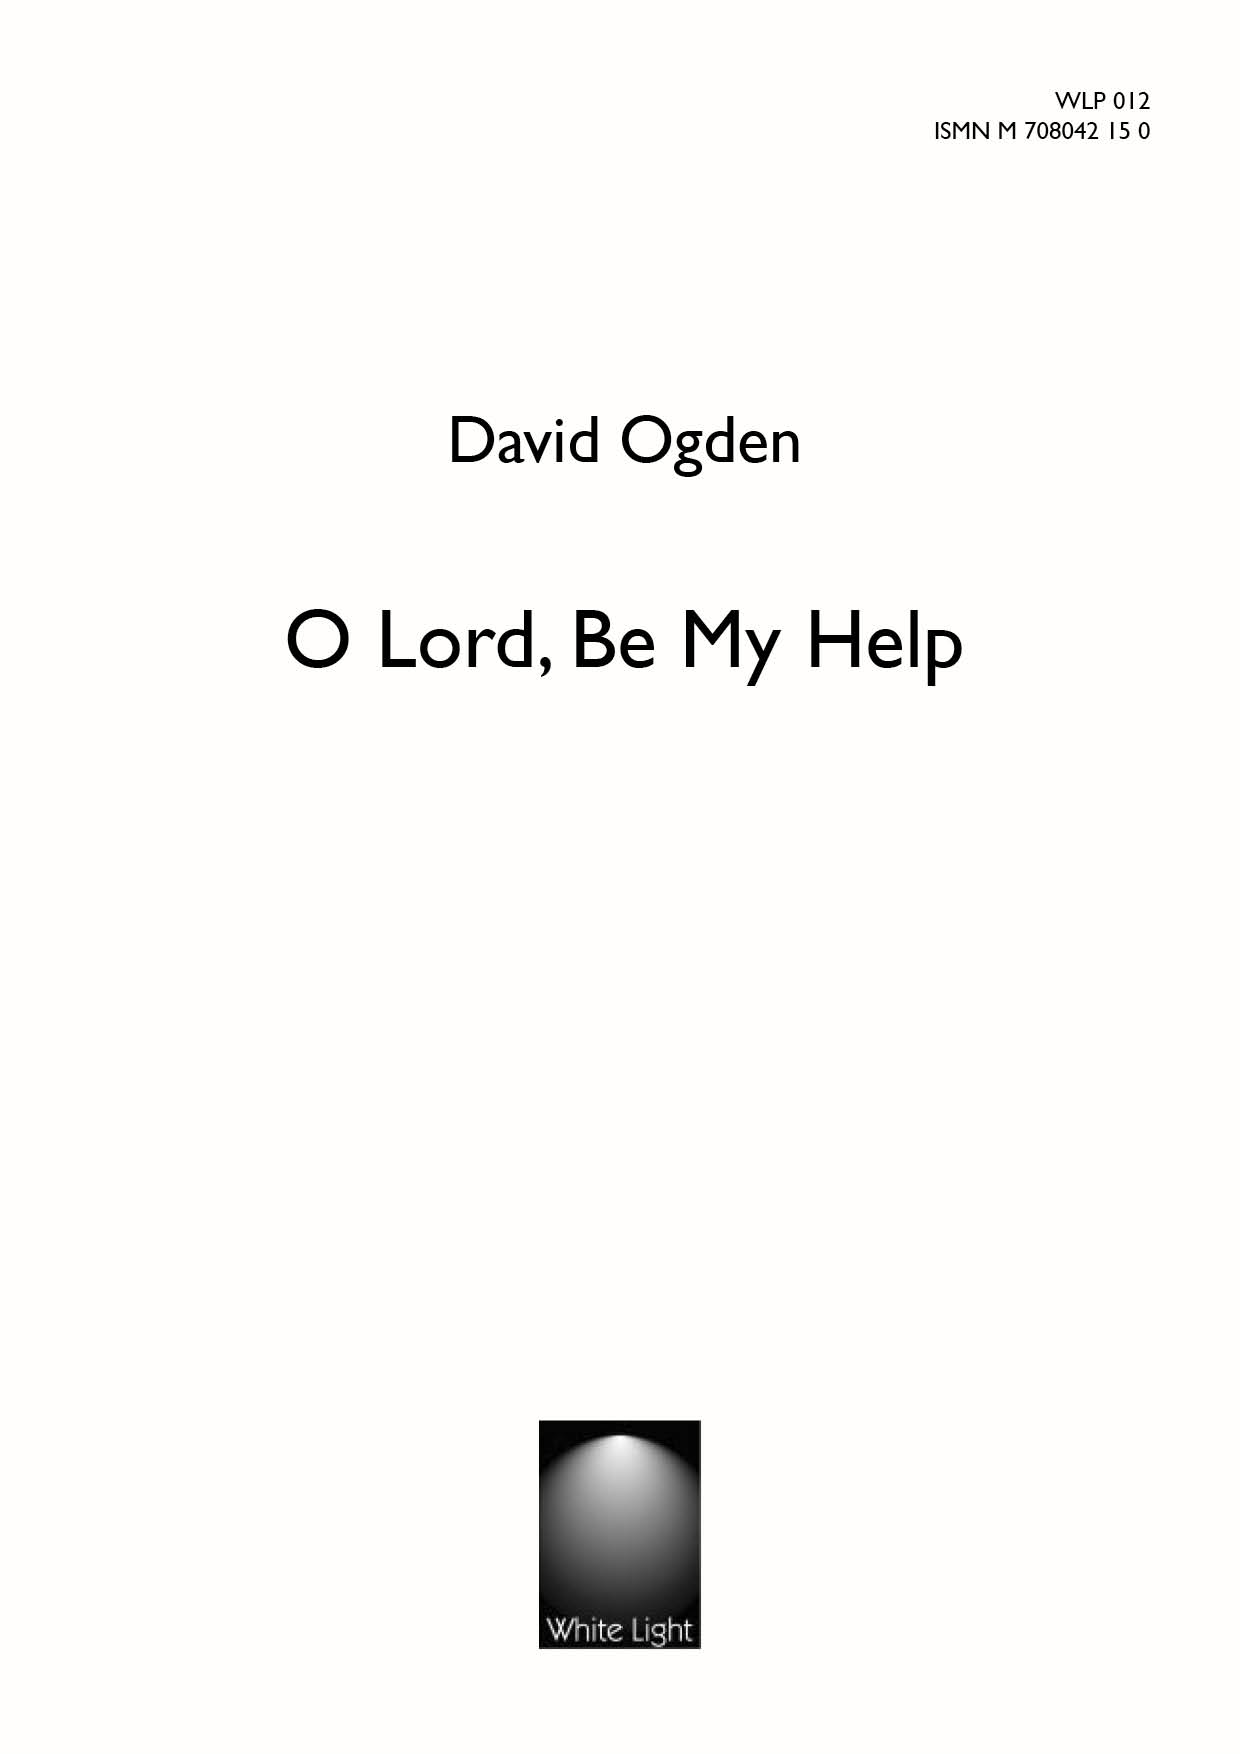 O Lord be my help